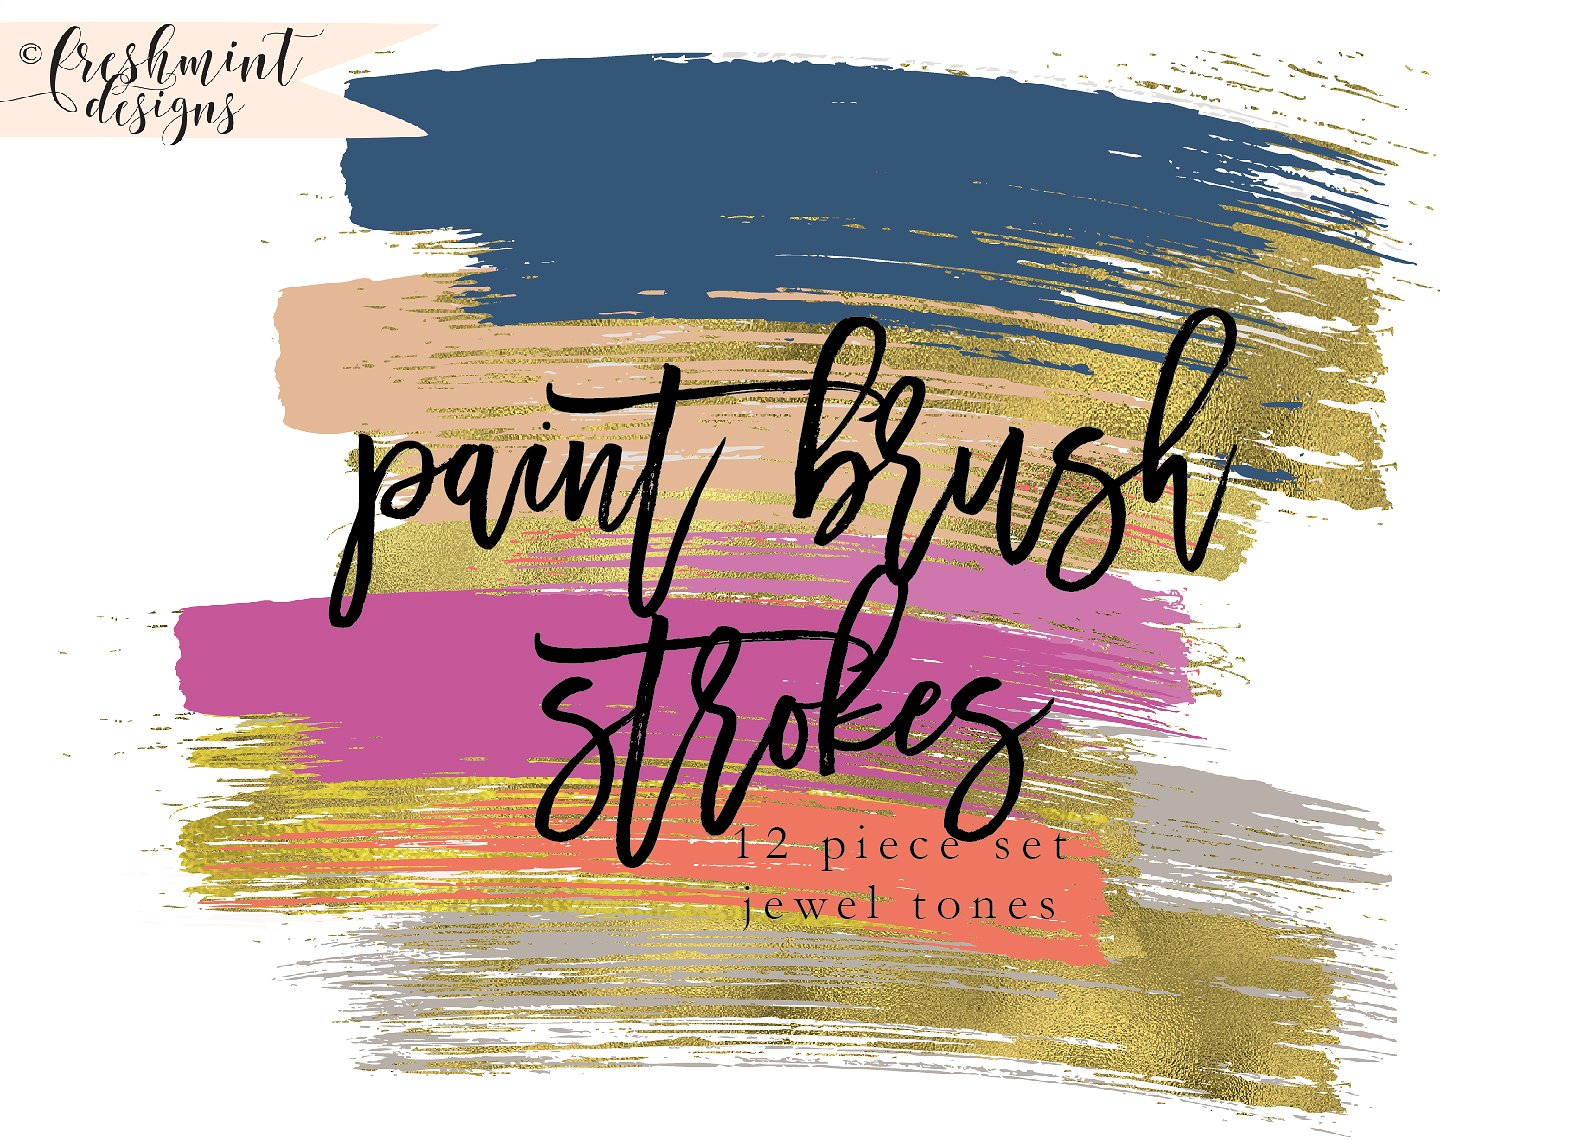 Bush clipart paint. Gold foil brush strokes